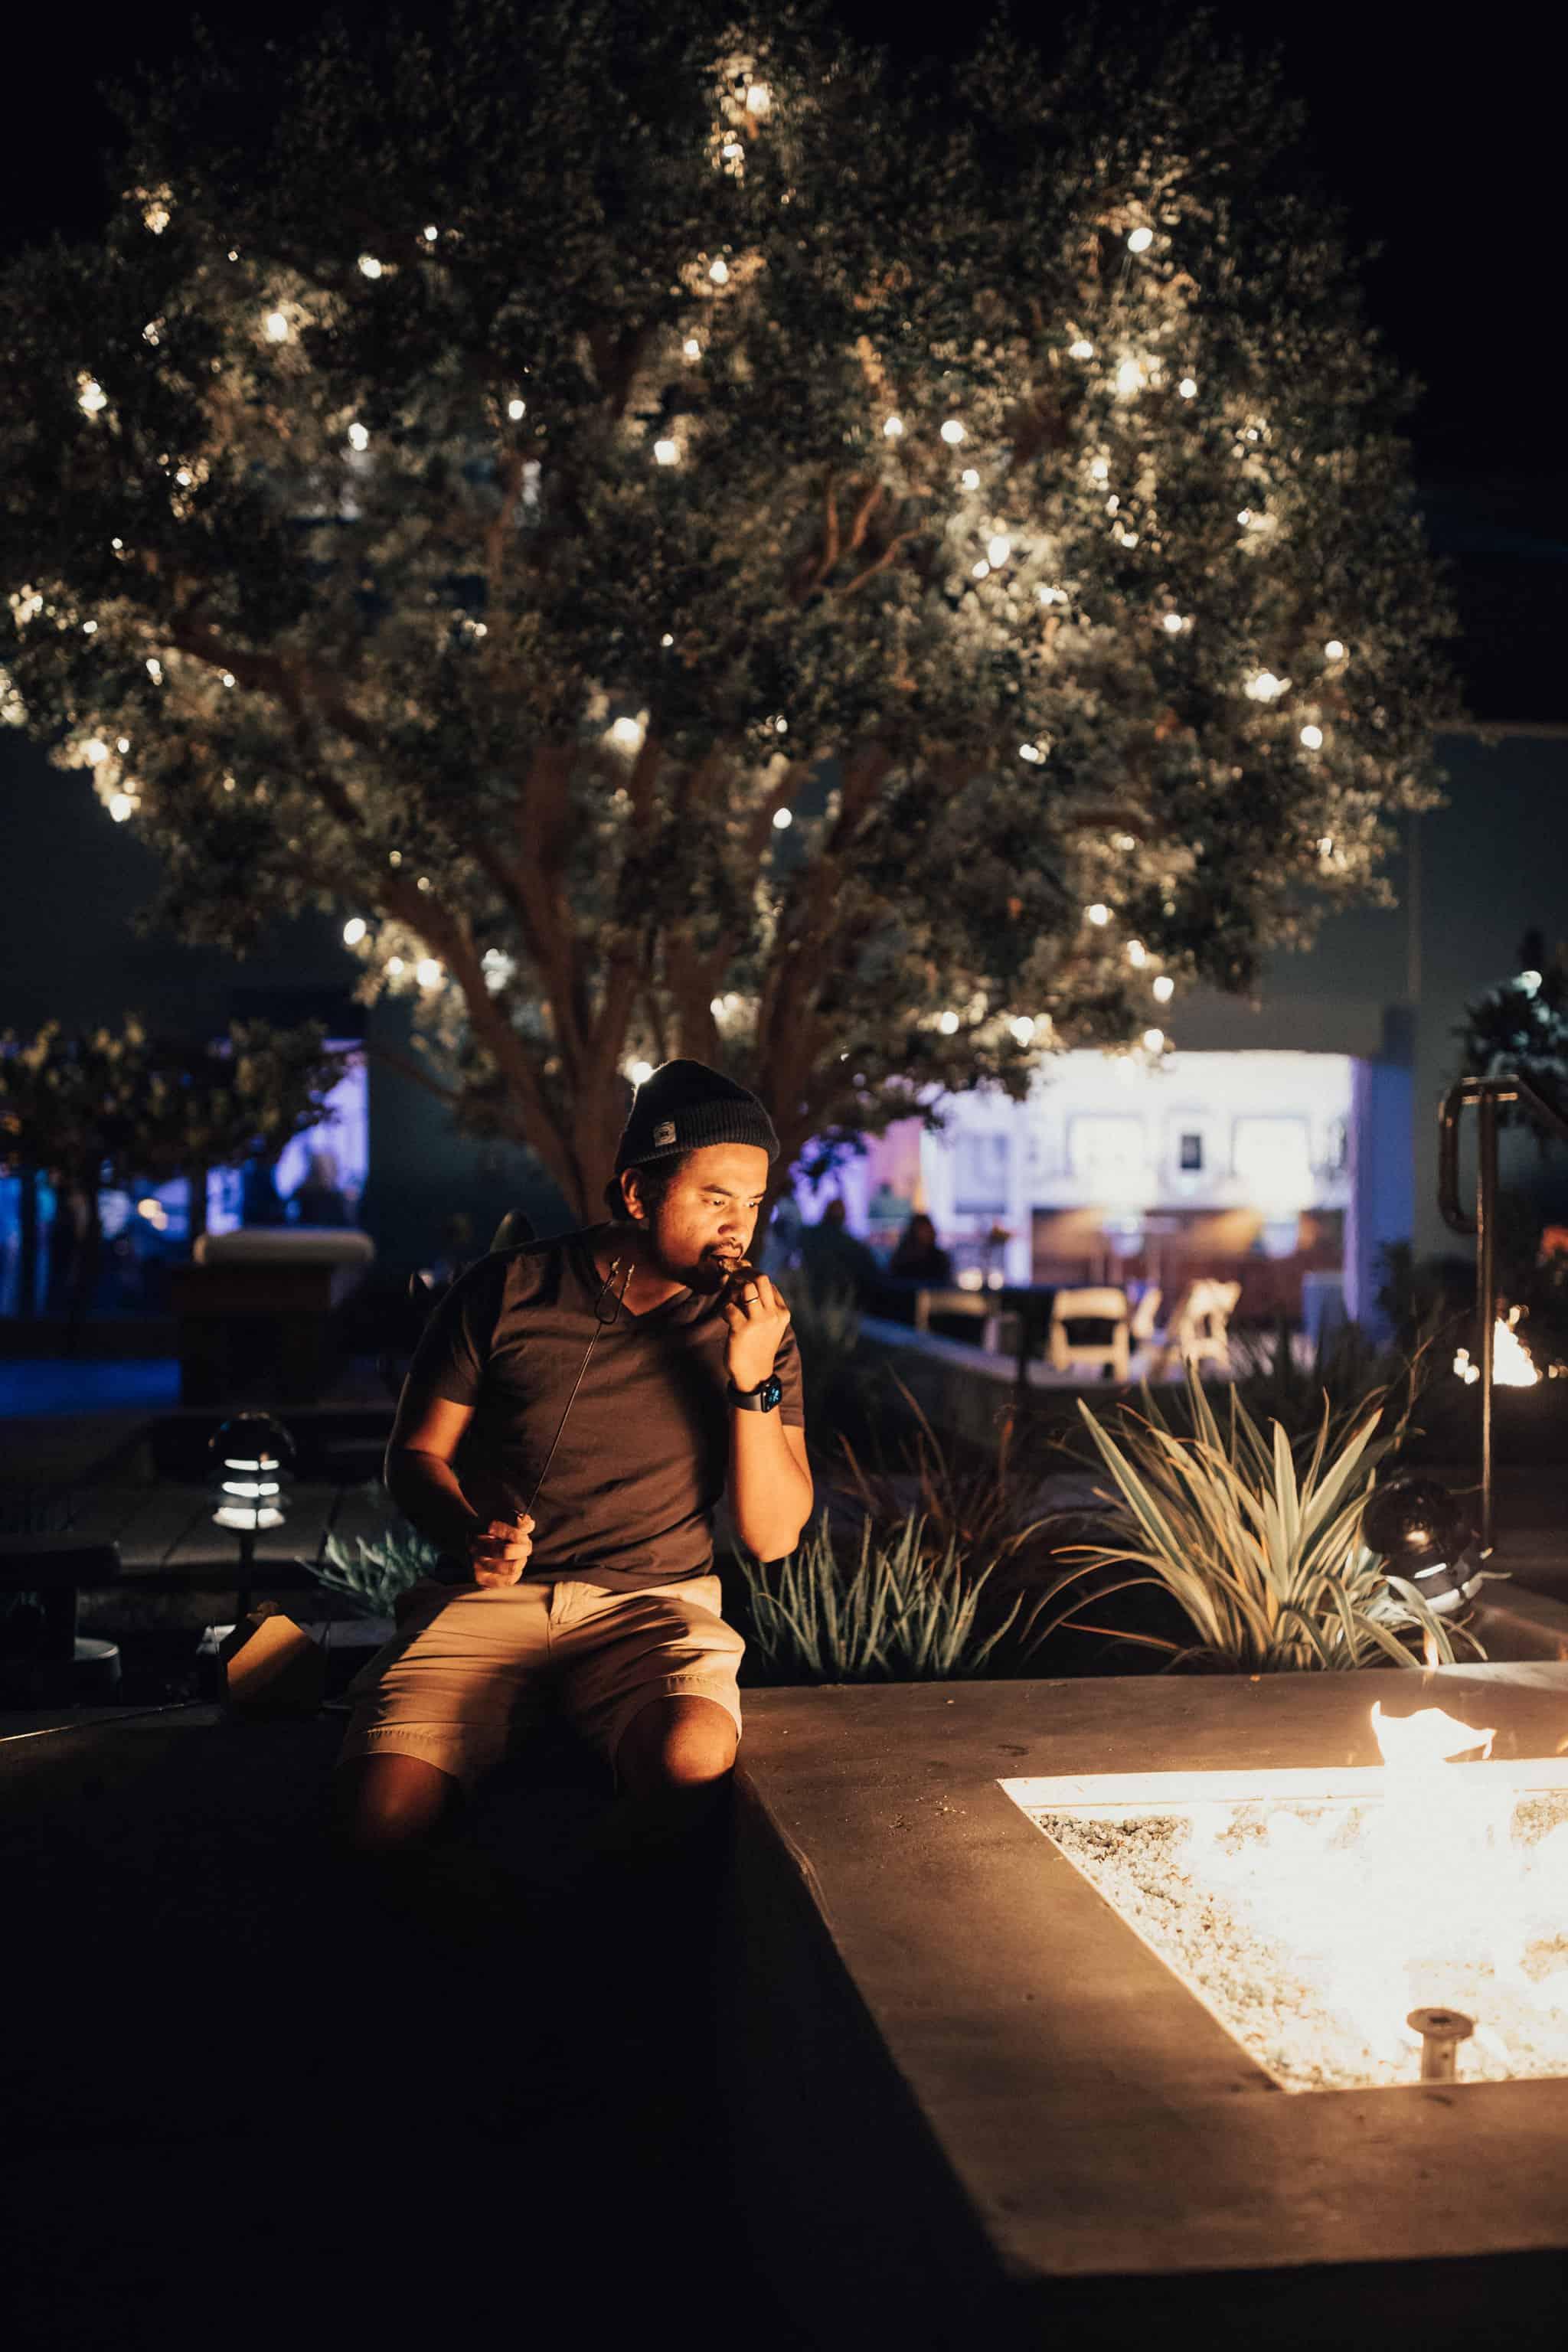 Berty roasting smores at Shorebreak Hotel Huntington Beach - TheMandagies.com